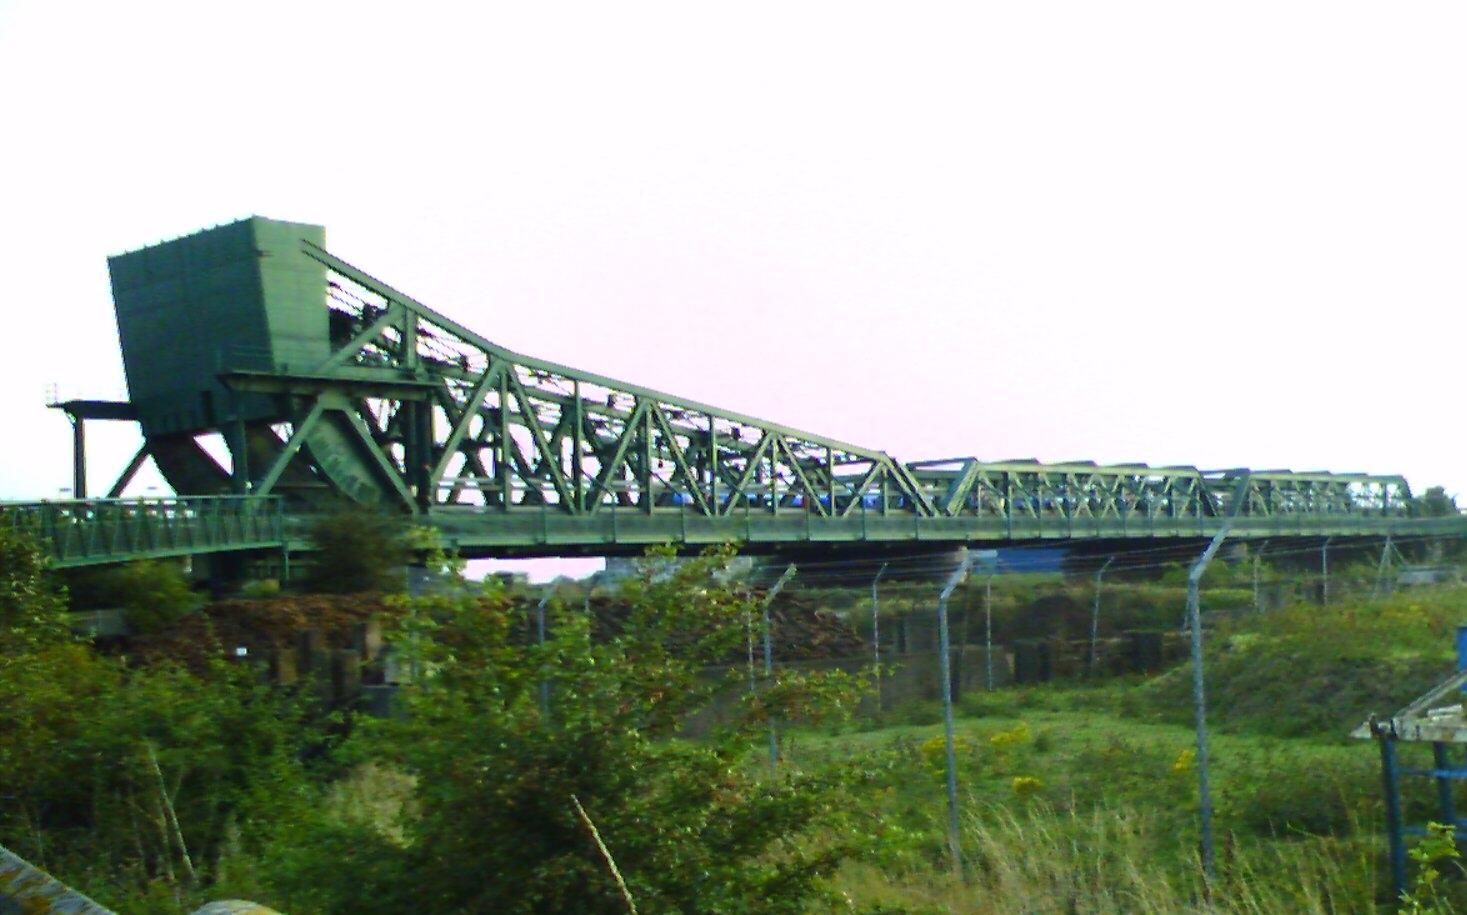 Image result for keadby bridge